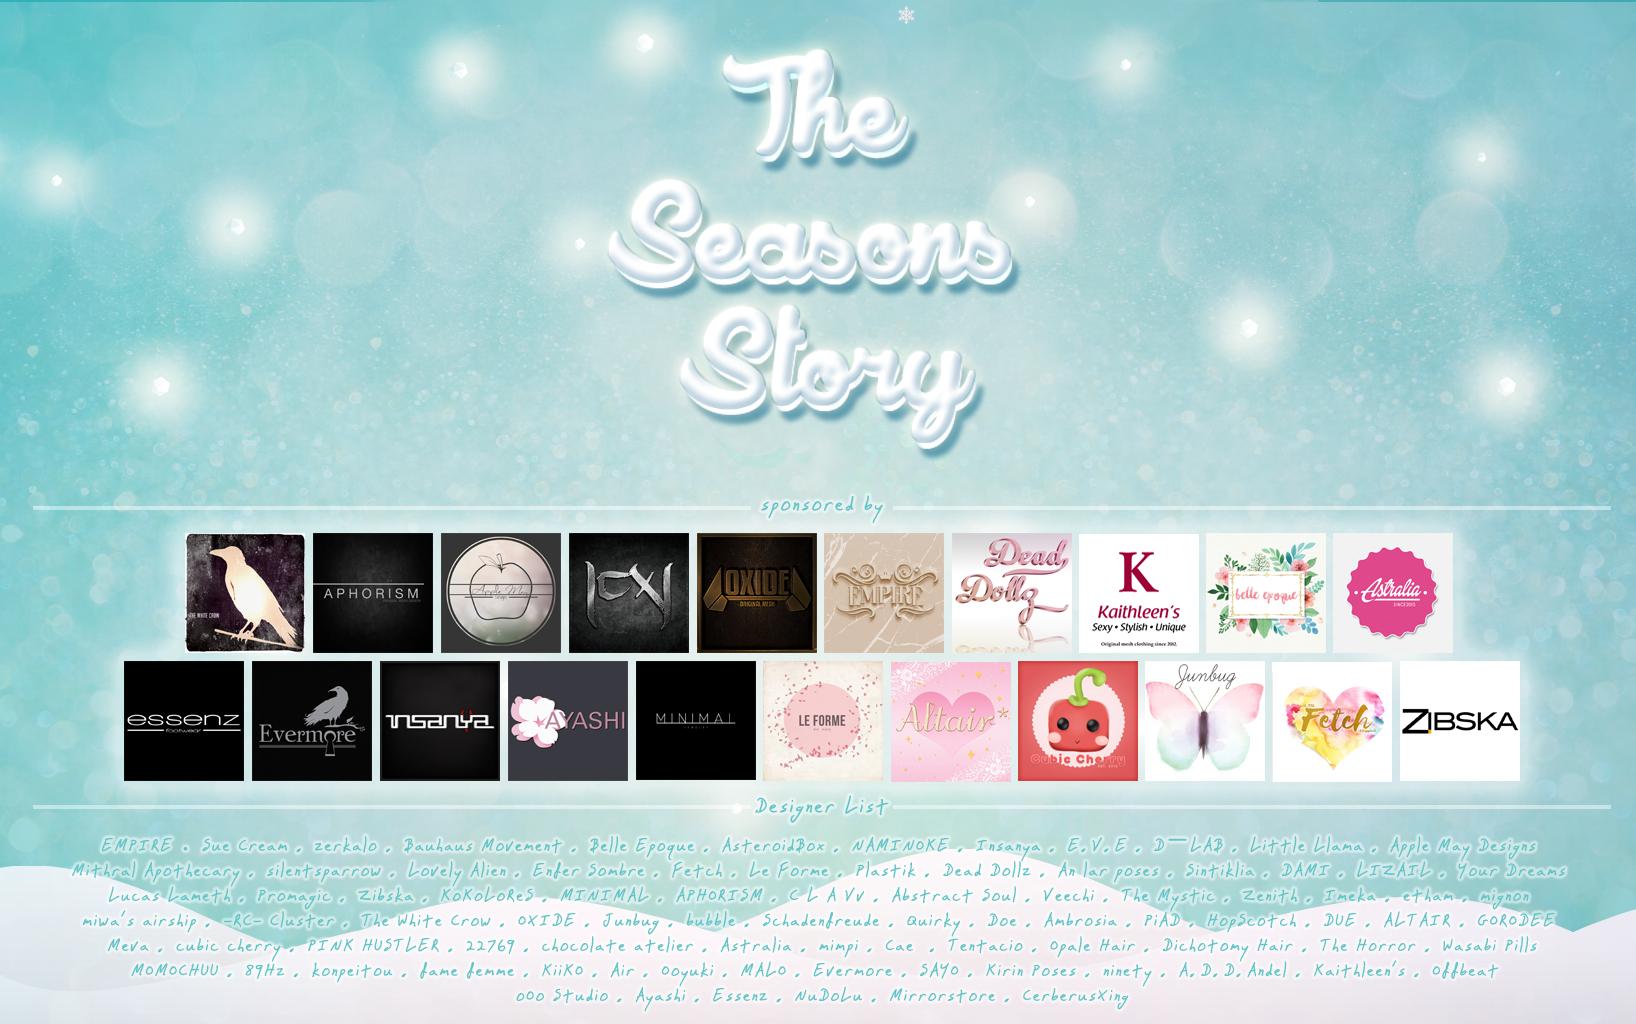 seasons_story_winter.png